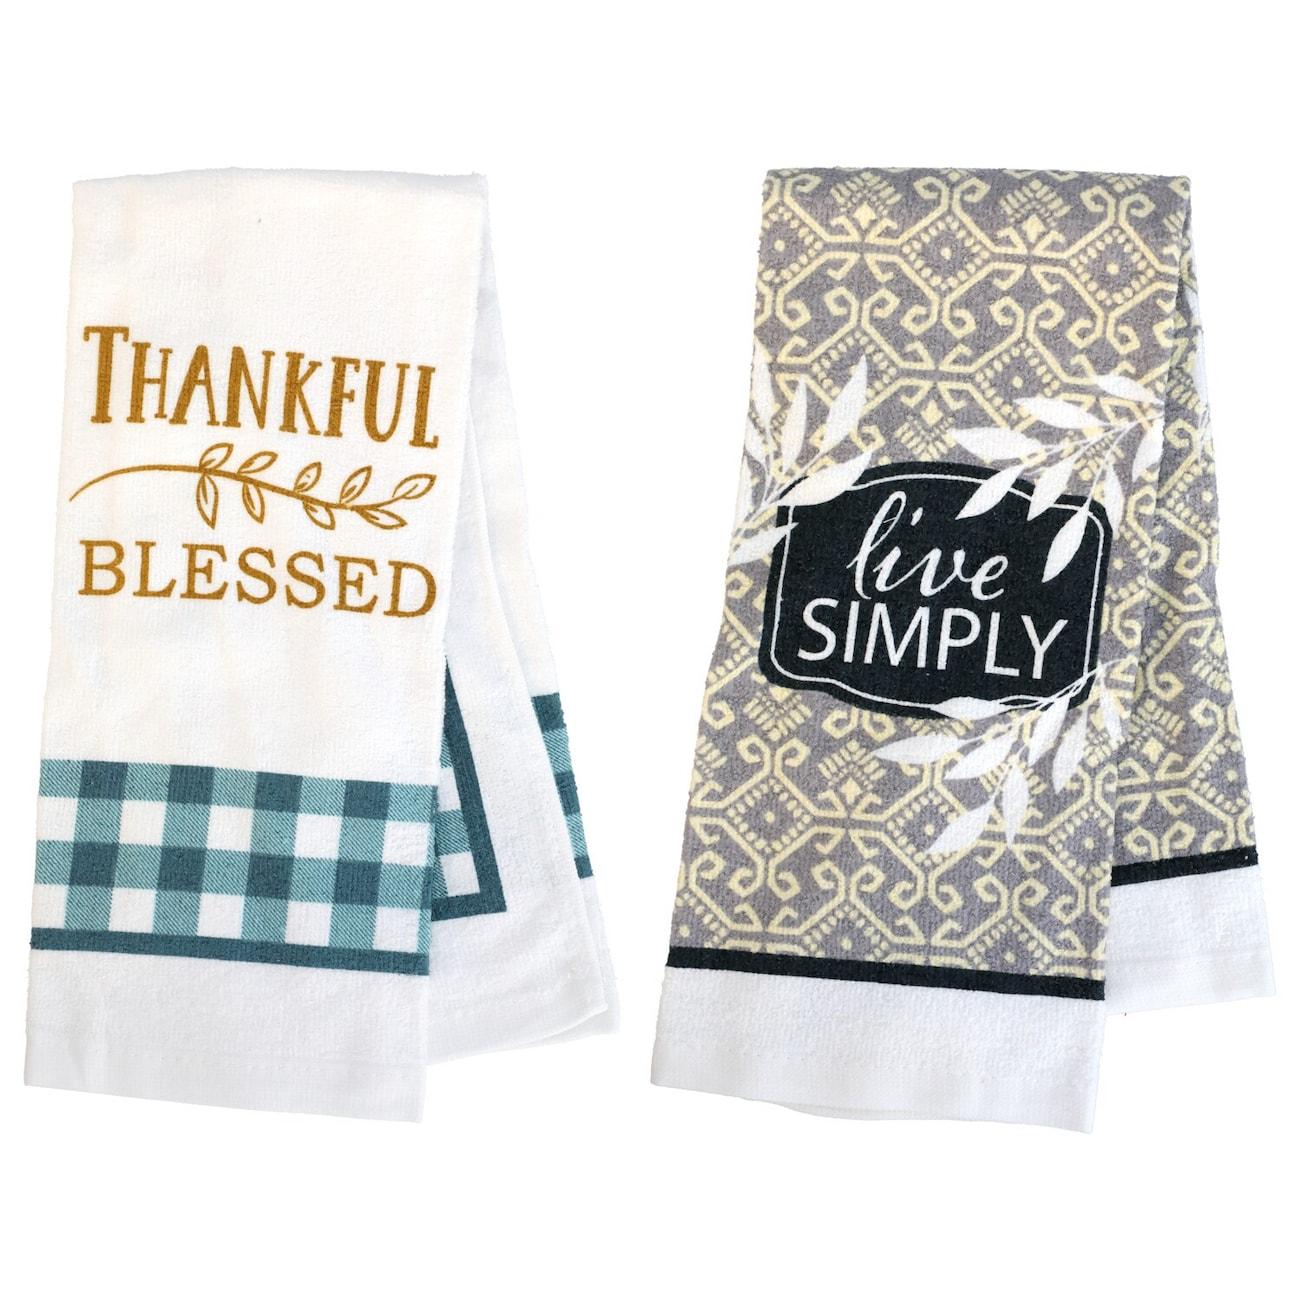 Hand Towels - Dollar Tree, Inc.